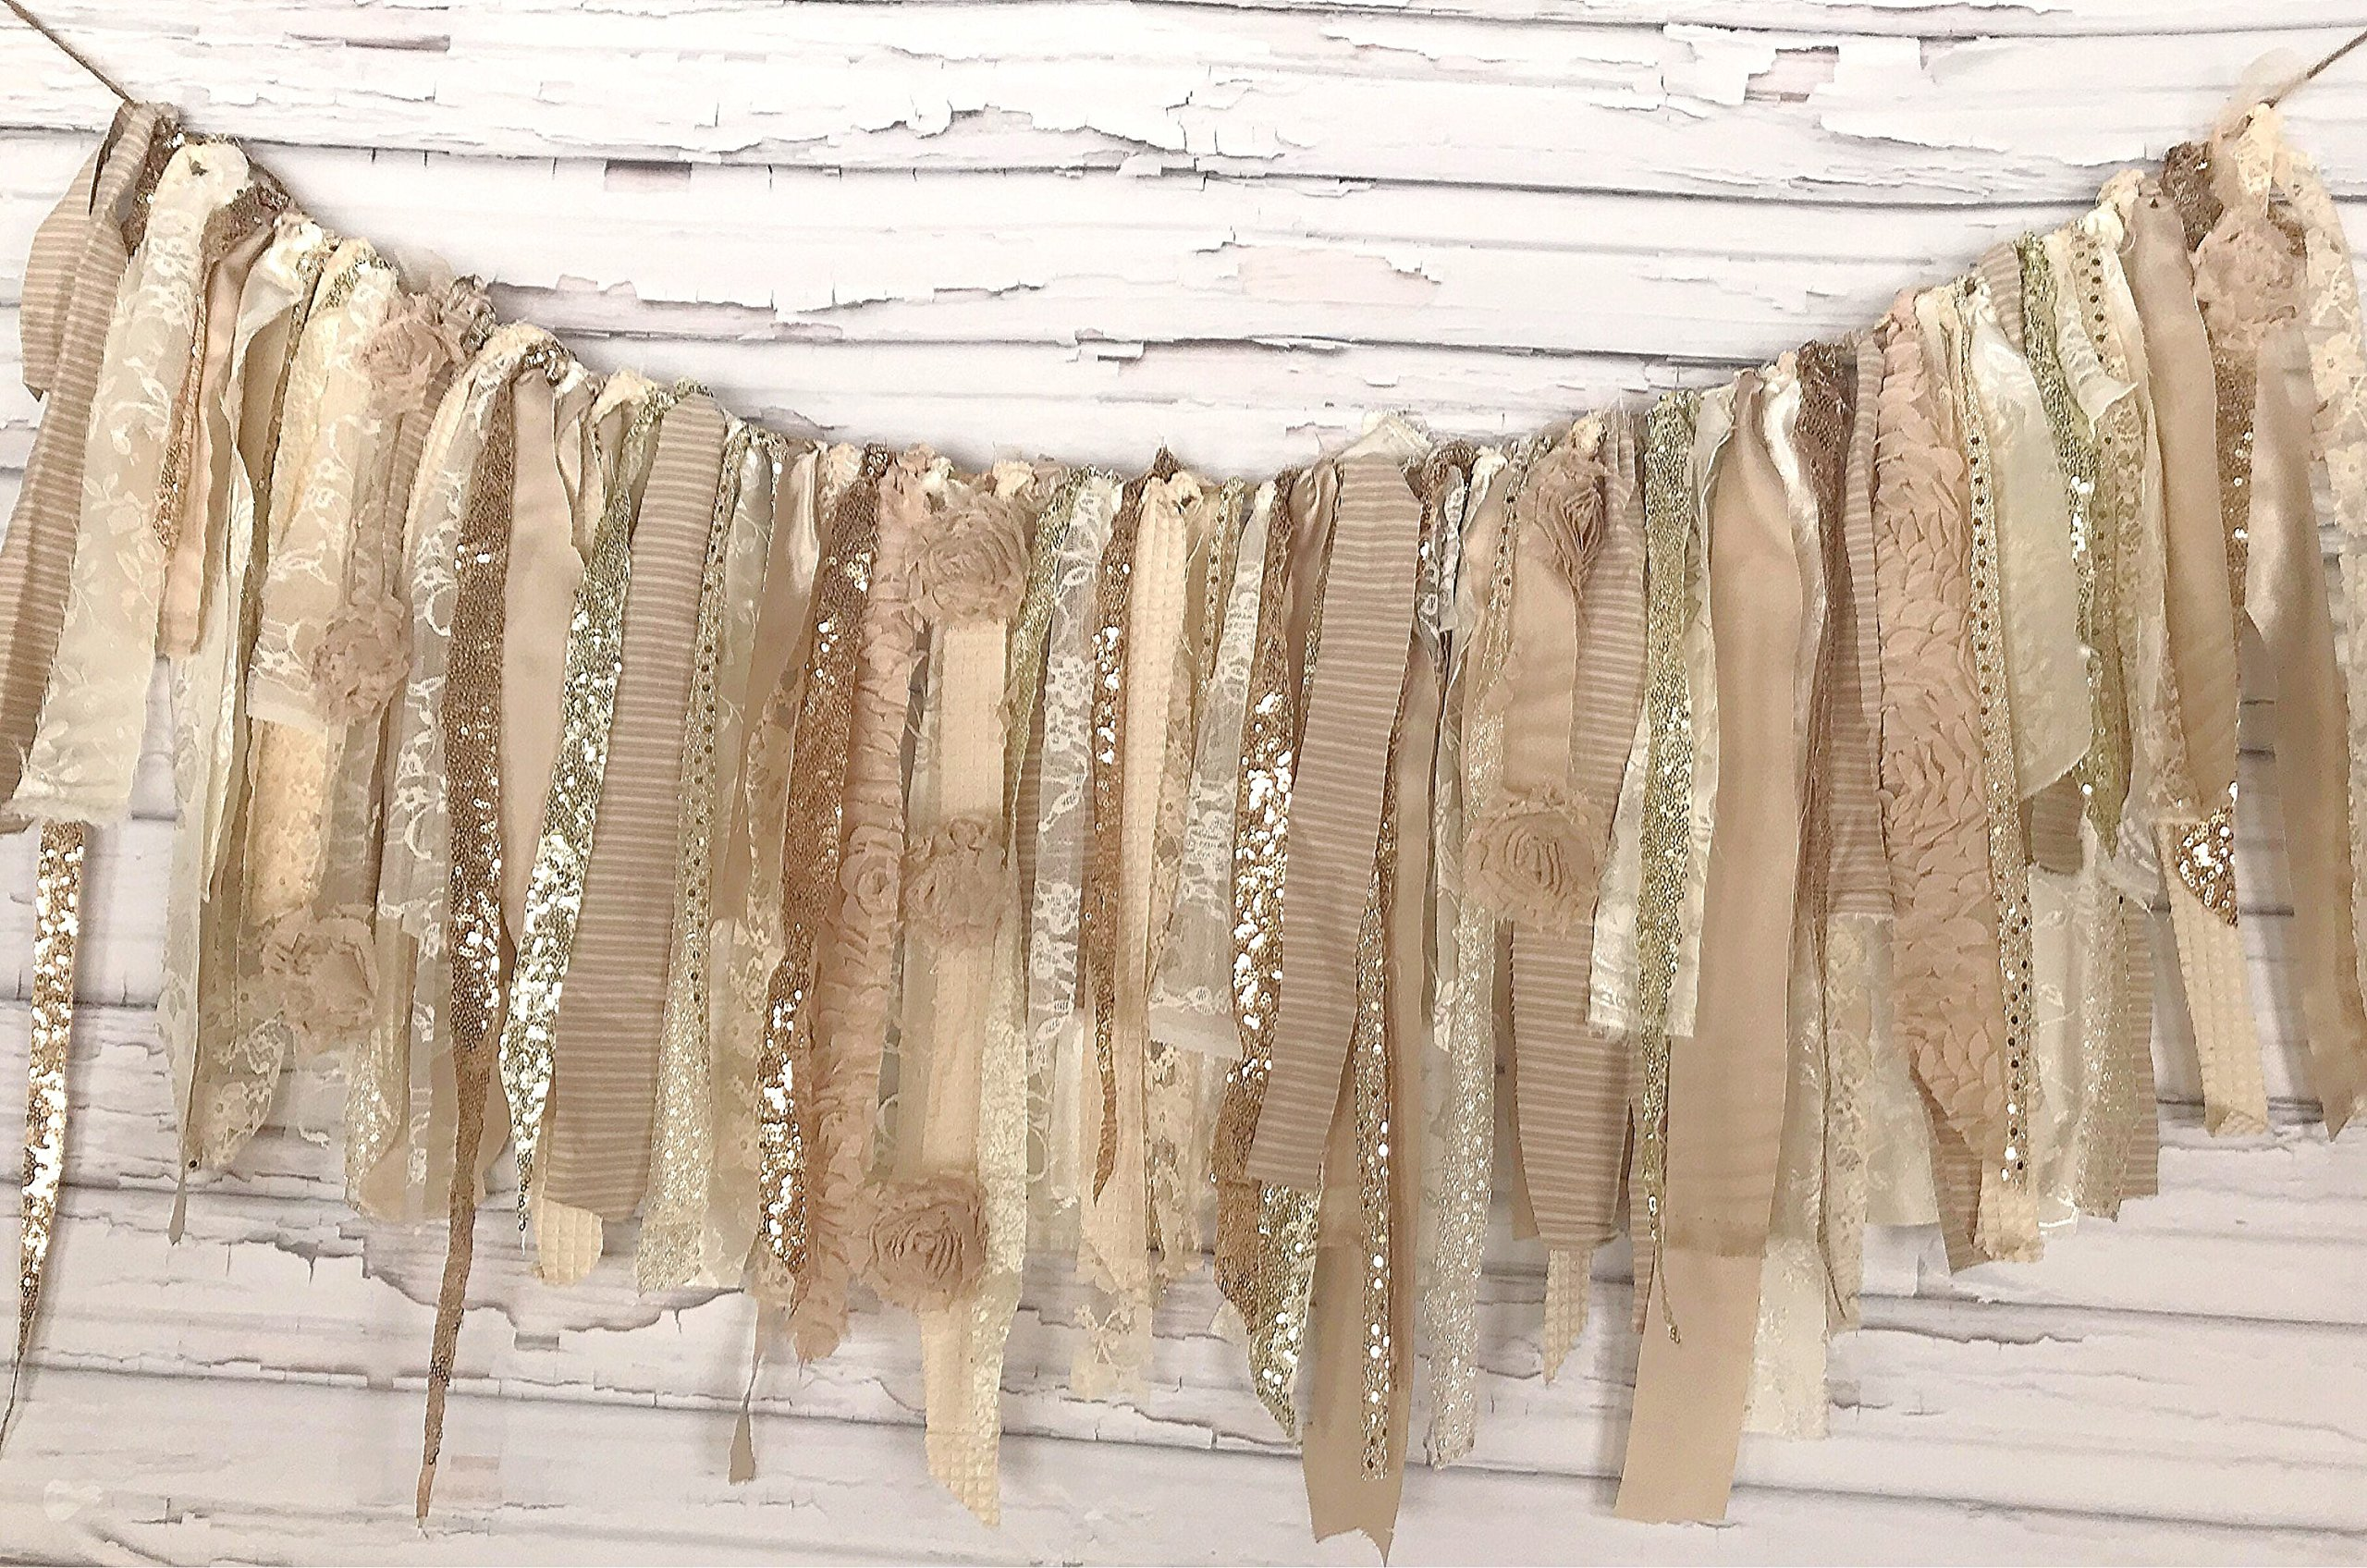 Neutral Gold Glitz Shabby Chic Rag Tie Garland: ~ Photo Shoot ~ Wedding ~ Birthday ~ Nursery ~ Bridal Shower ~ Highchair Banner ~ Gender Reveal Parties ~ Decorations ~ Wall Decor! (5 FEET WIDE)